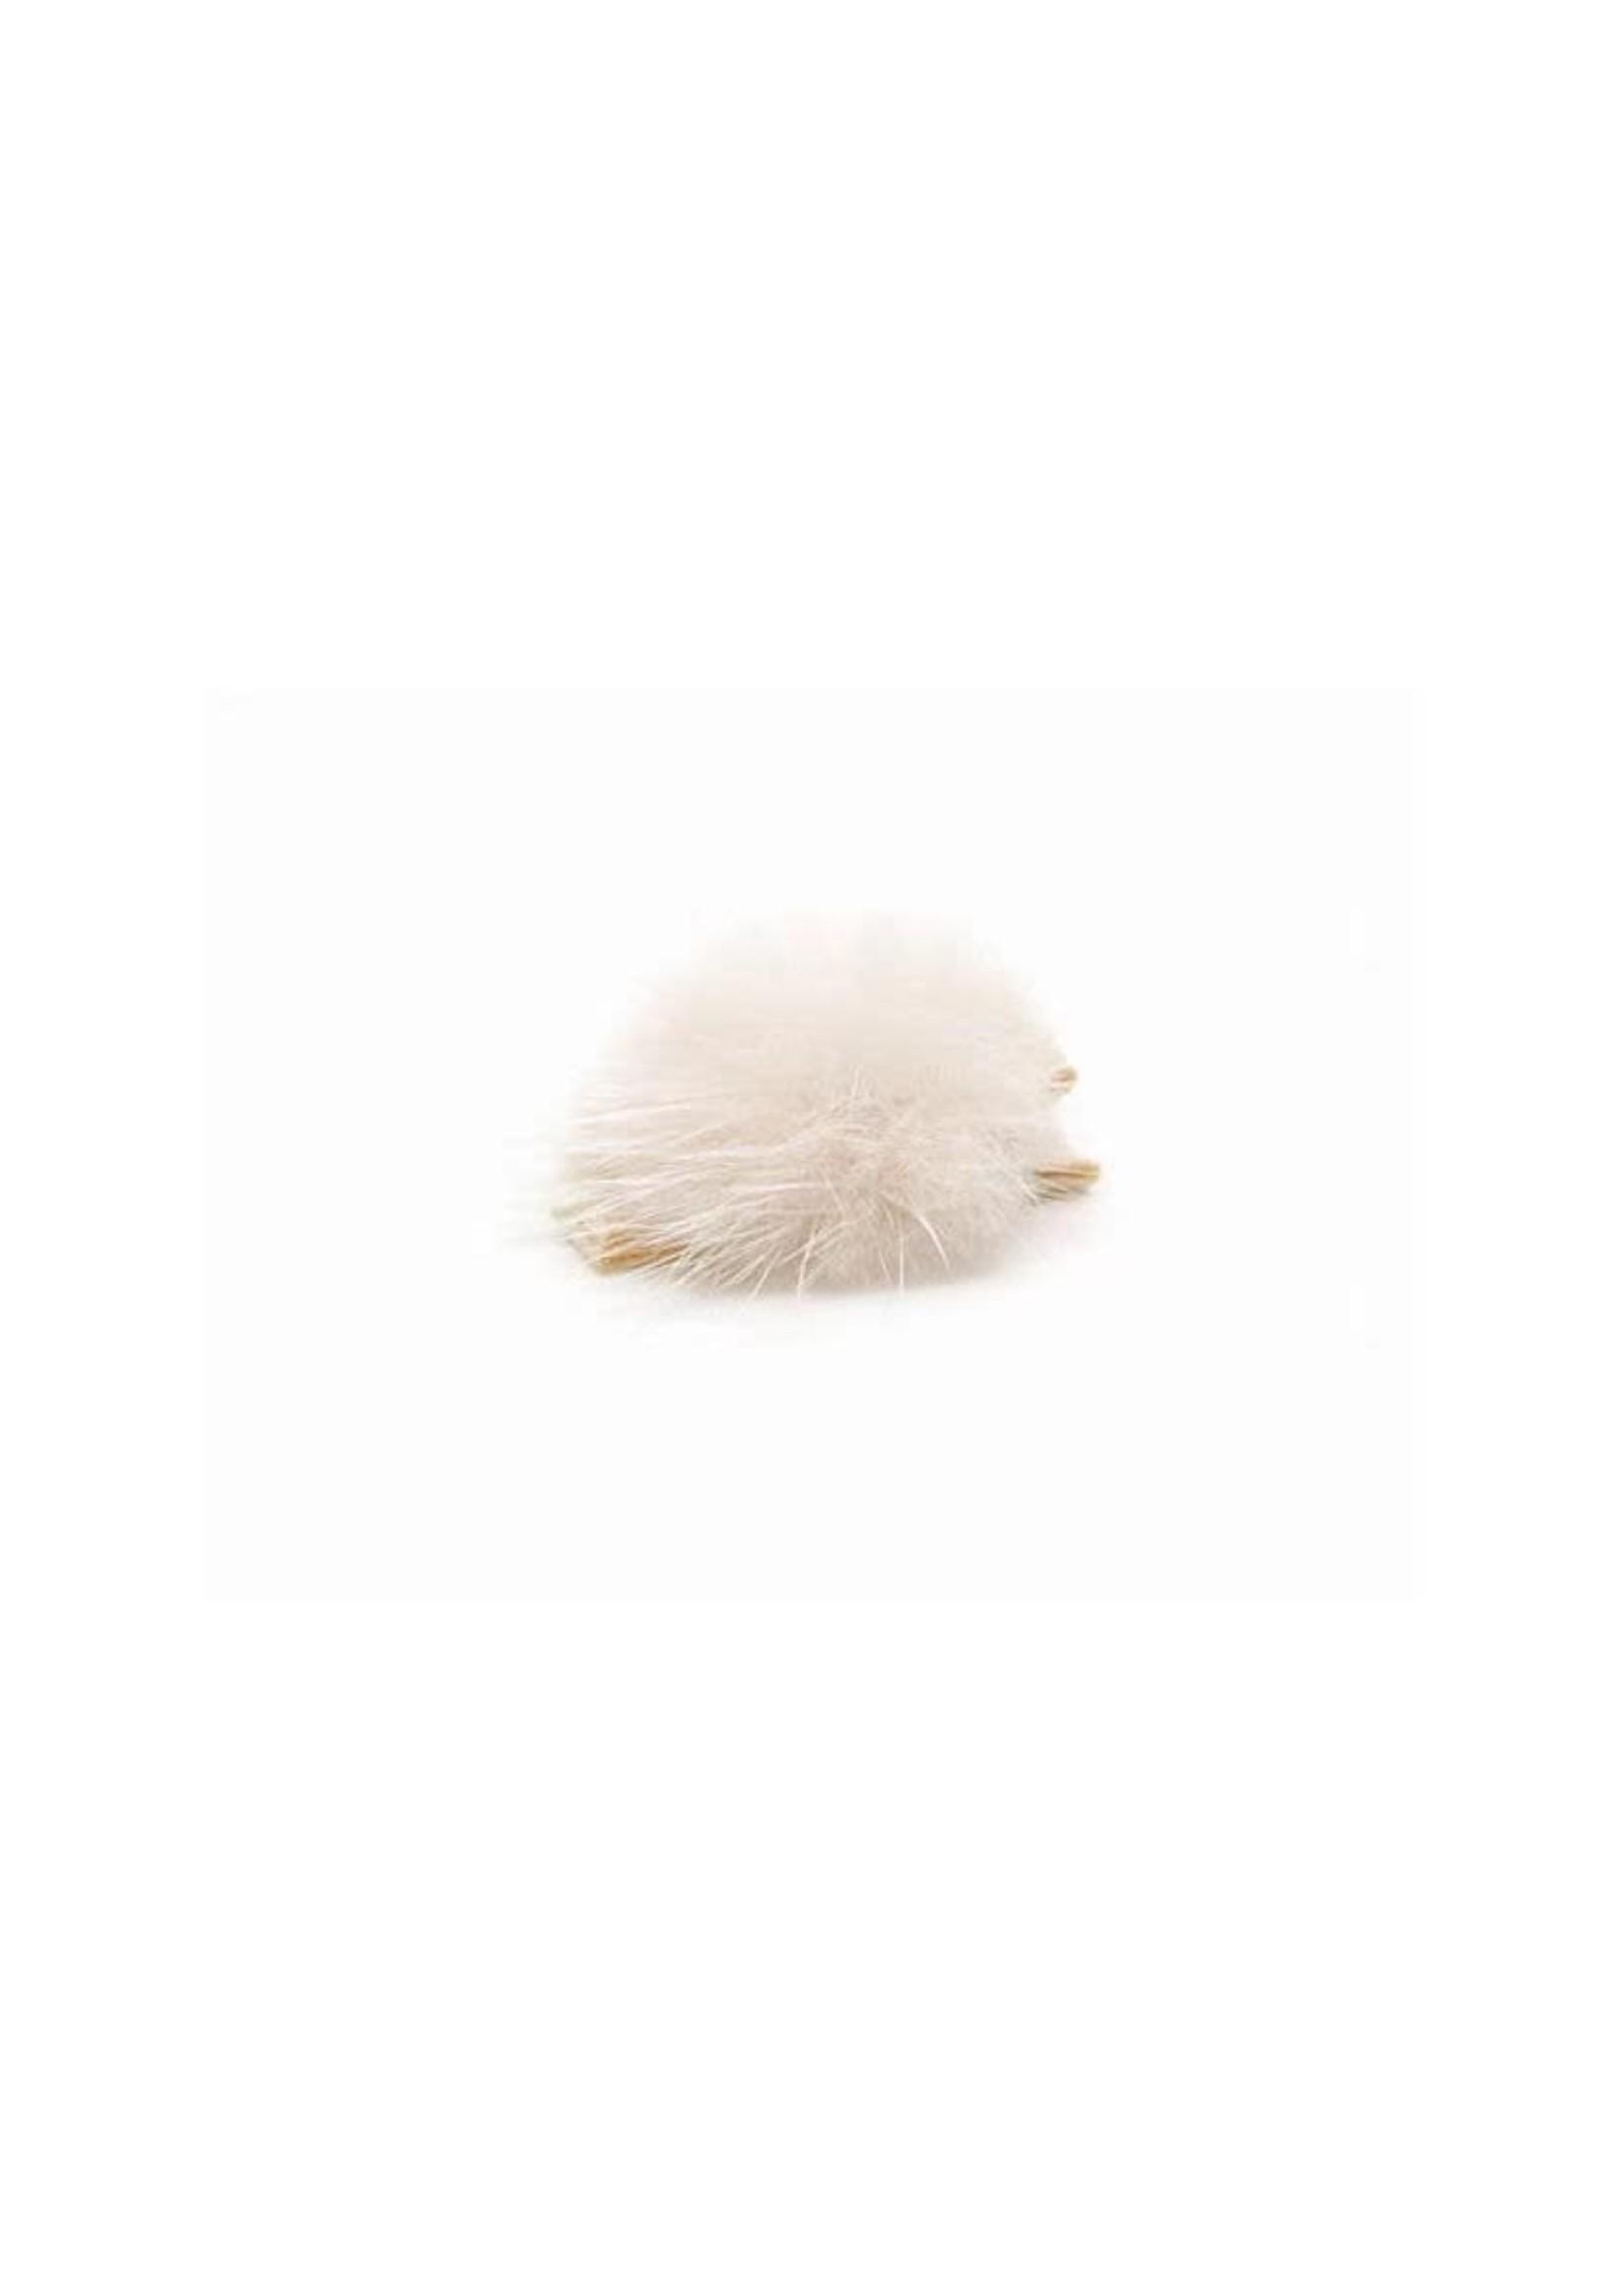 olilia Olilia Small Mink Puff Hair Clip - Nude